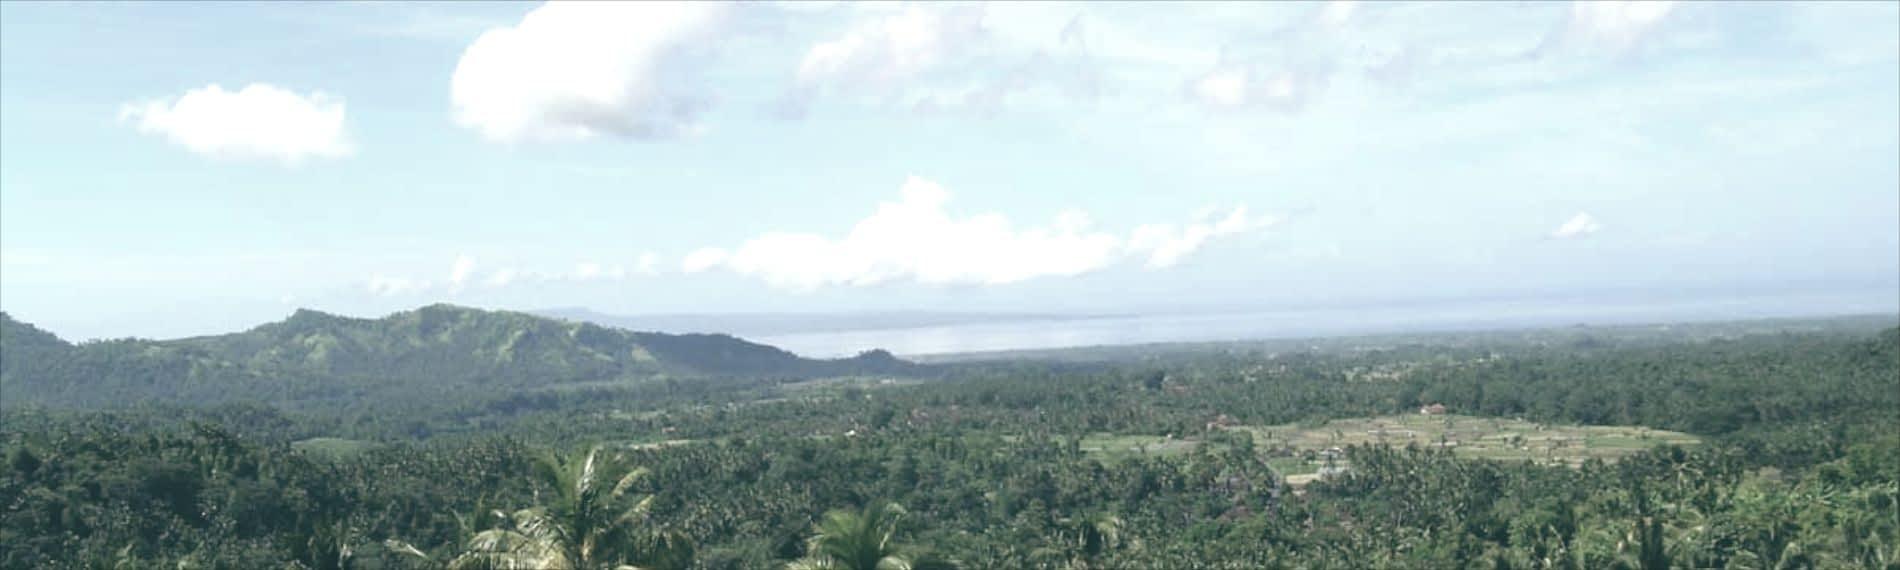 https://mlcb8szwyxfv.i.optimole.com/tTCGqh8-oDyPefMt/w:auto/h:auto/q:62/https://www.uniqueteambuilding.com.au/wp-content/uploads/2014/10/Bali-retreat-rot-2.jpg